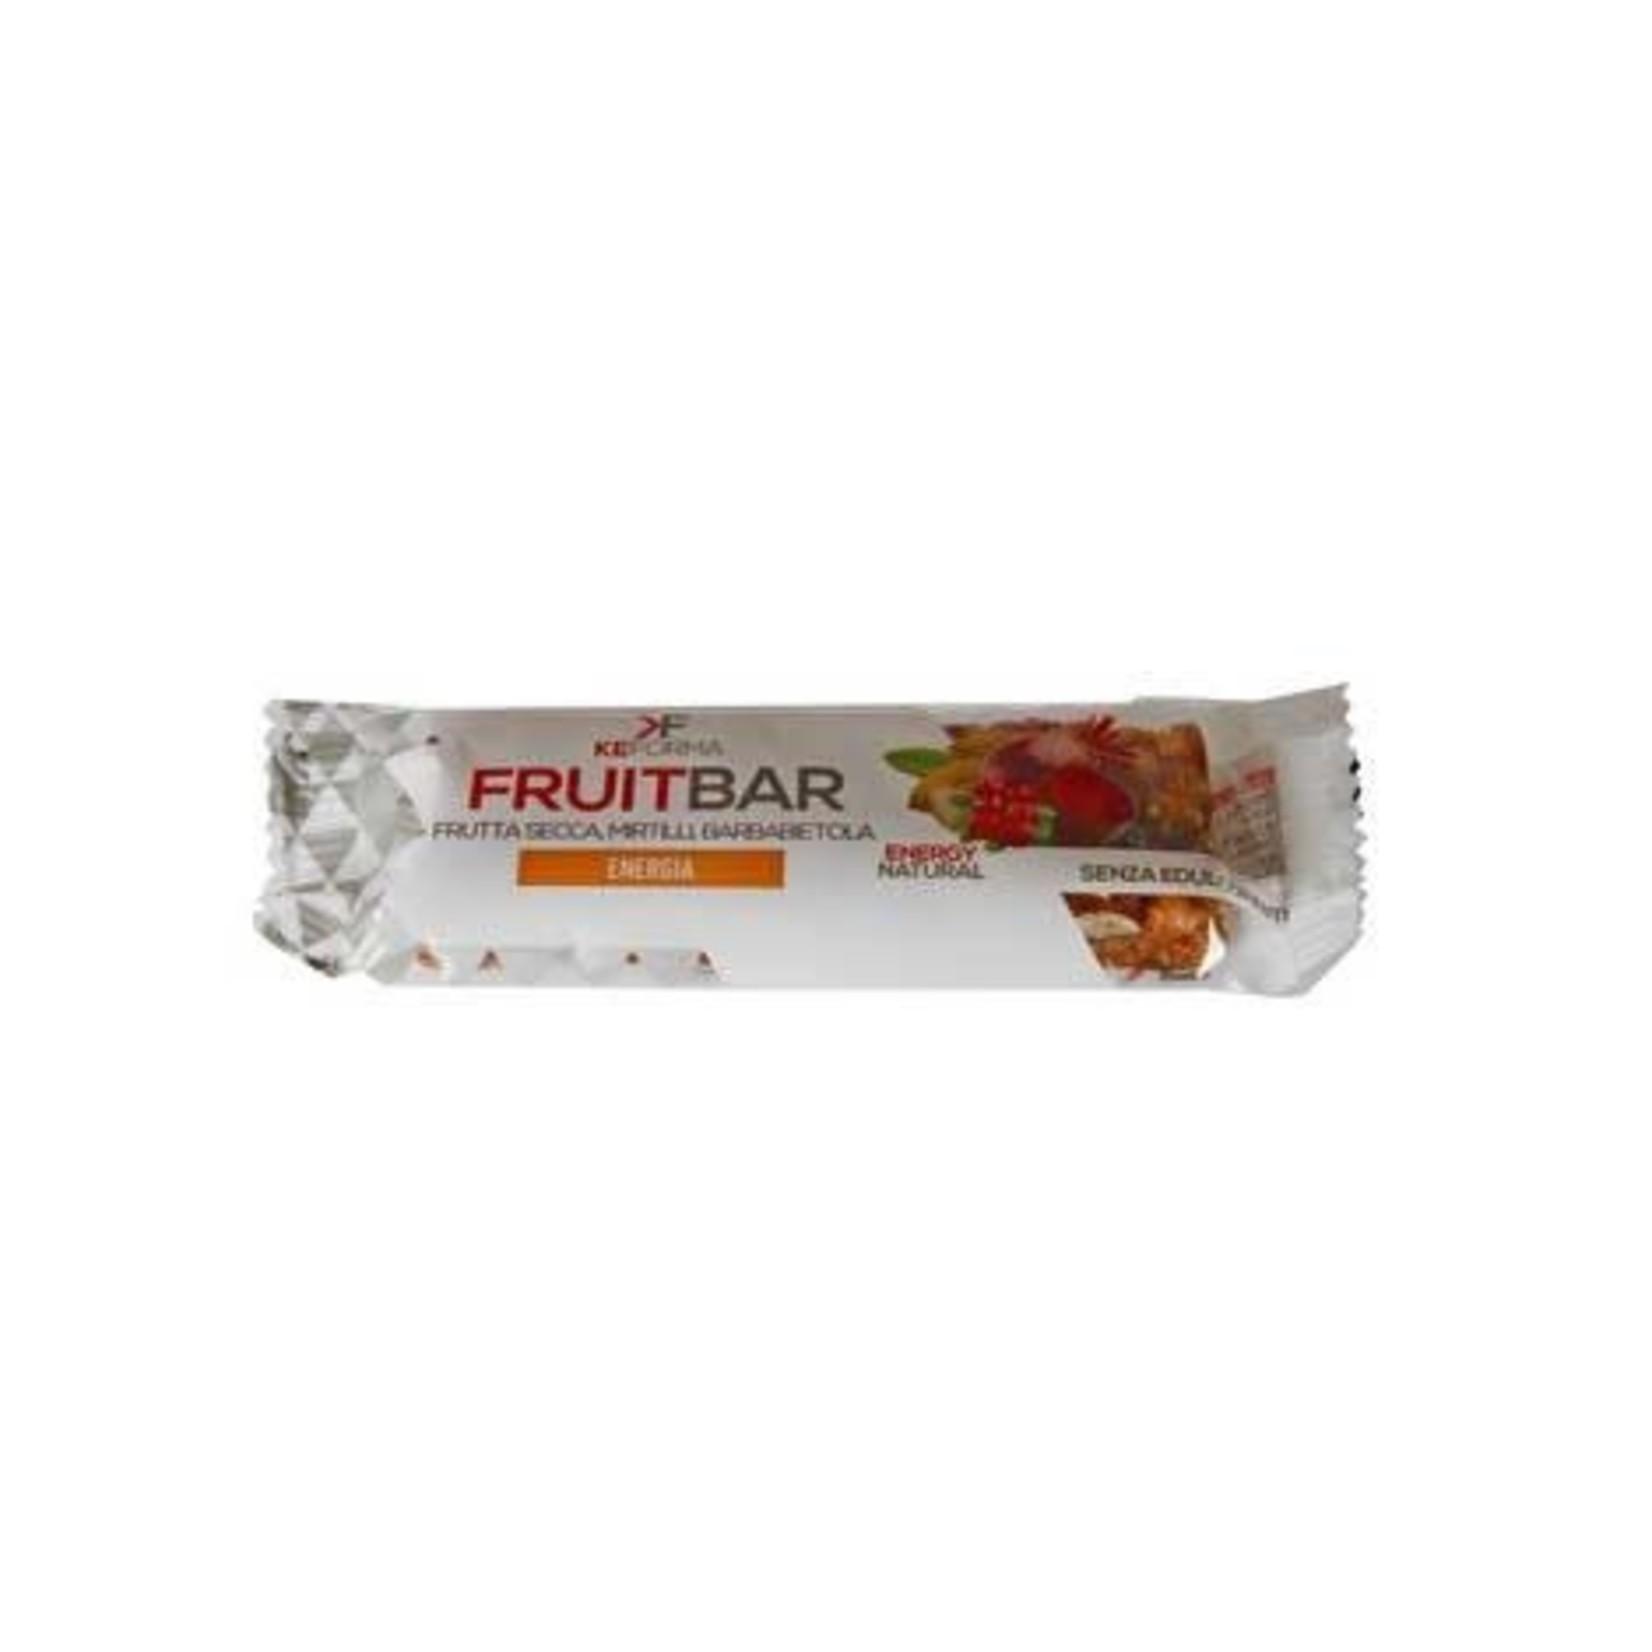 keforma KeForma - Fruitbar arachidi,albicocca e goji 30gr